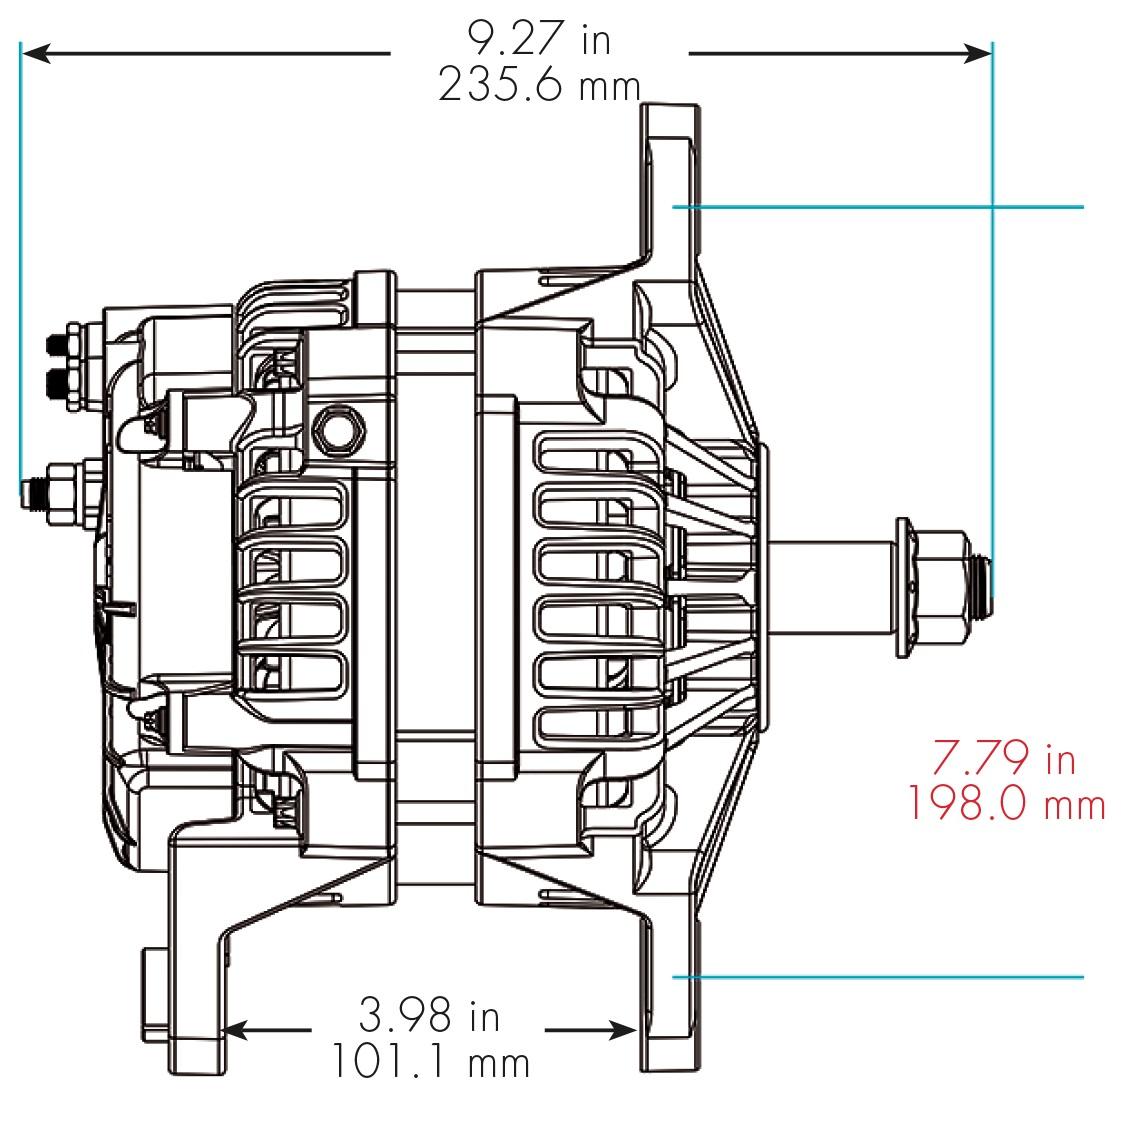 delco cs alternator wiring diagram toyota yaris 2000 radio 1993 chevy